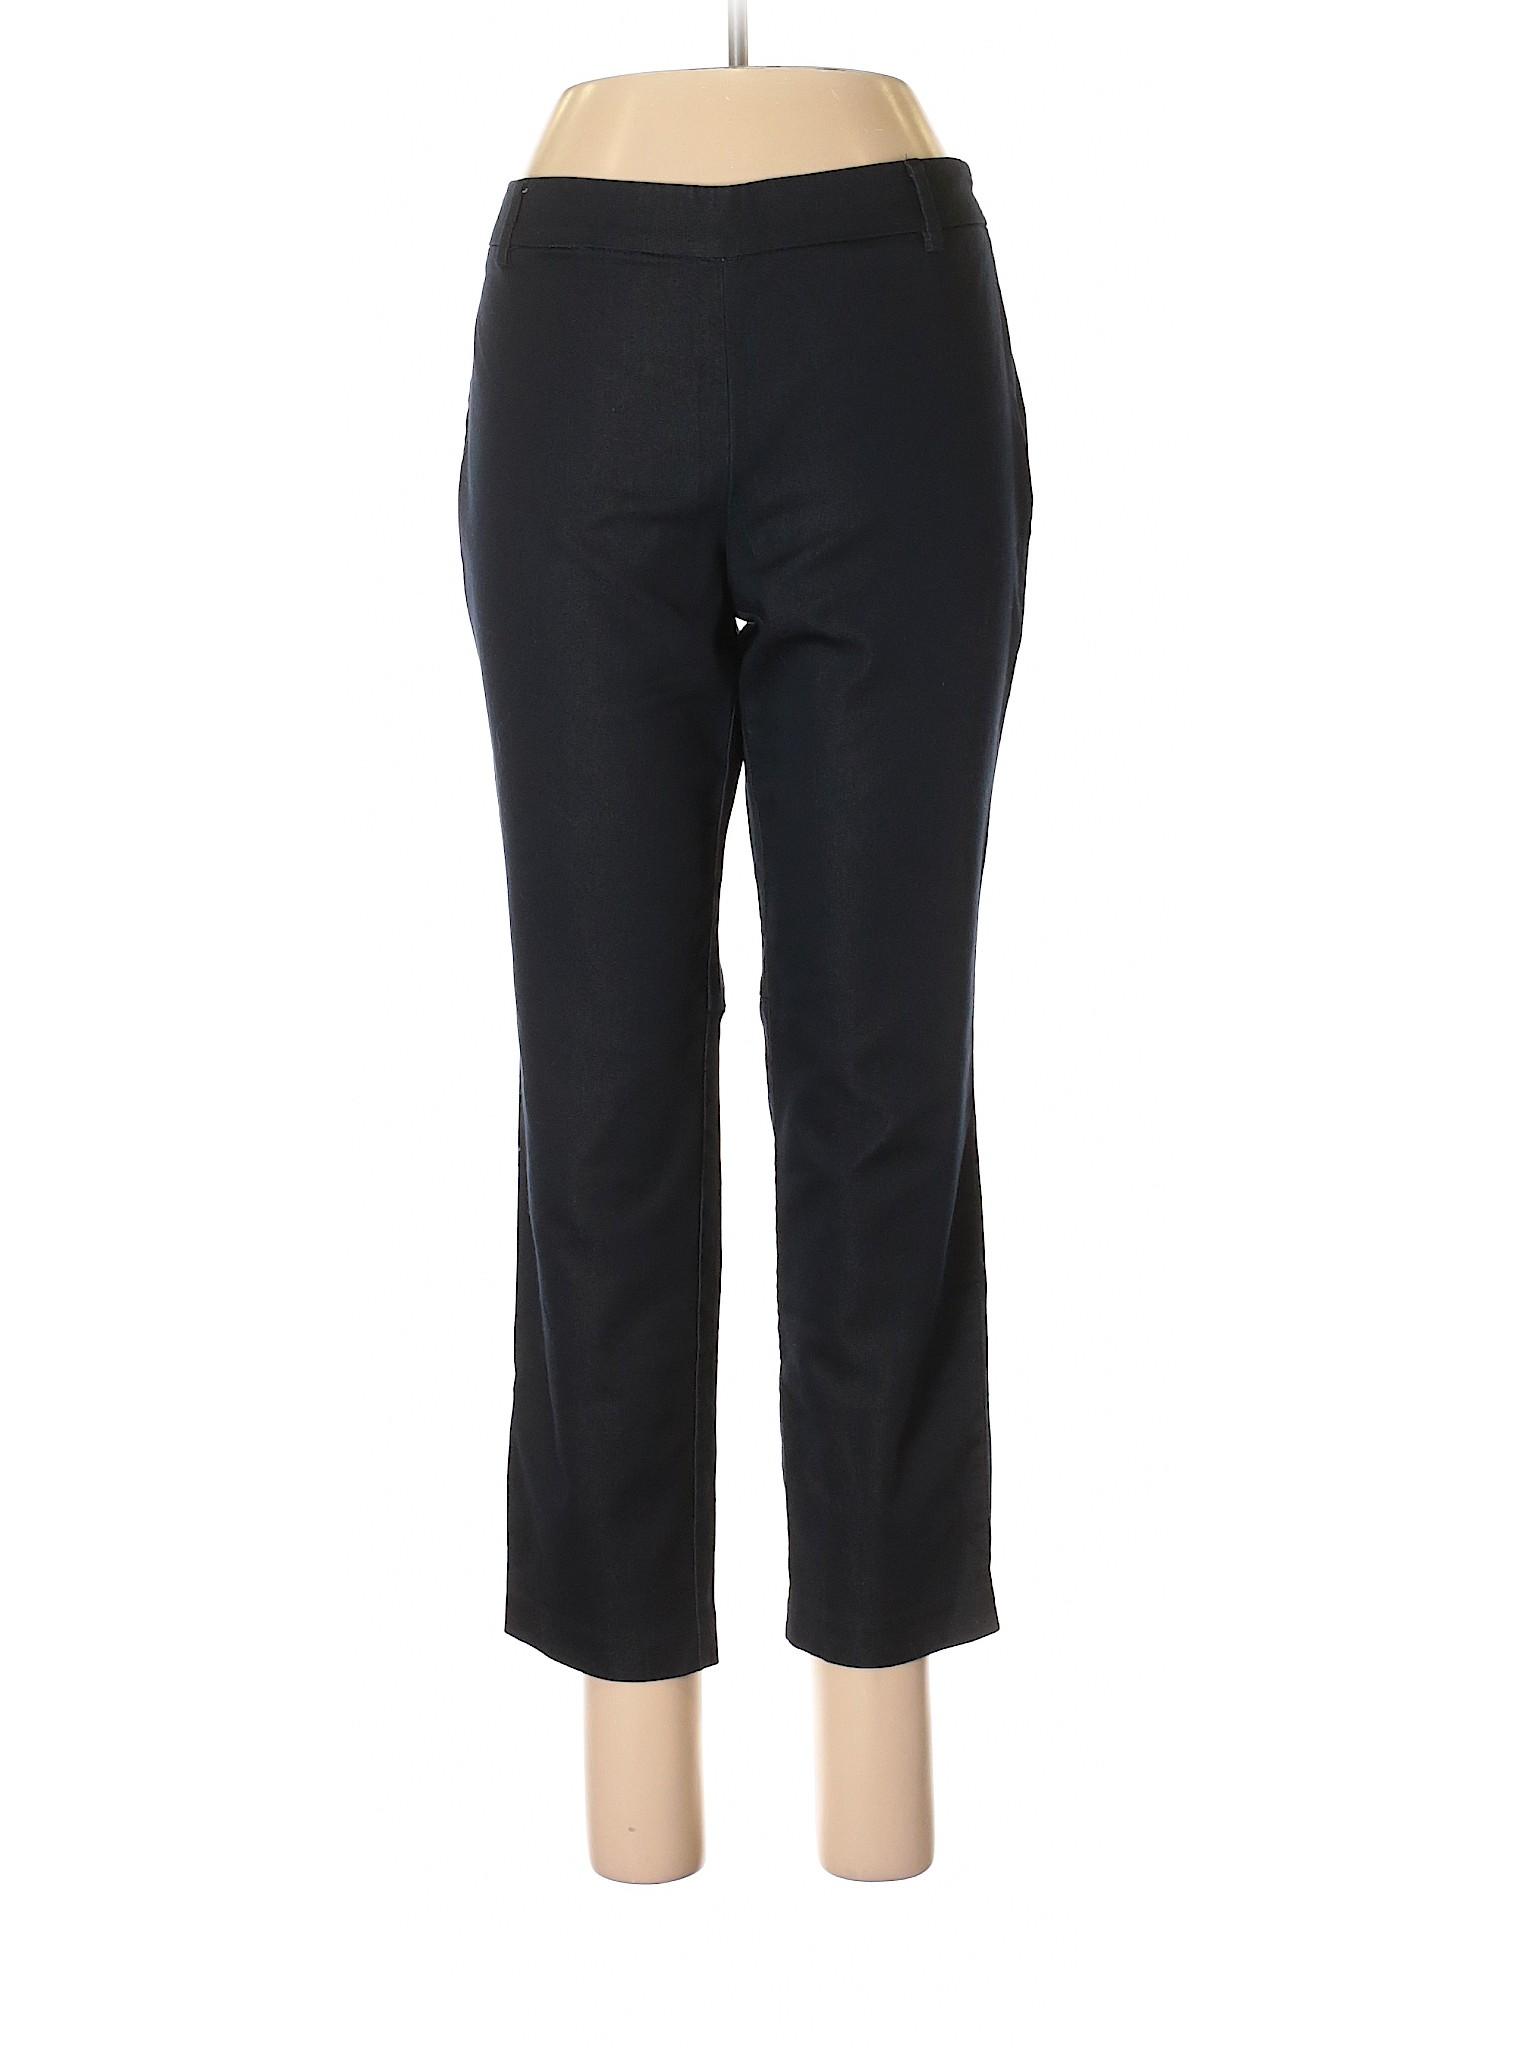 Boutique Dress New Company amp; Pants York rrqBT